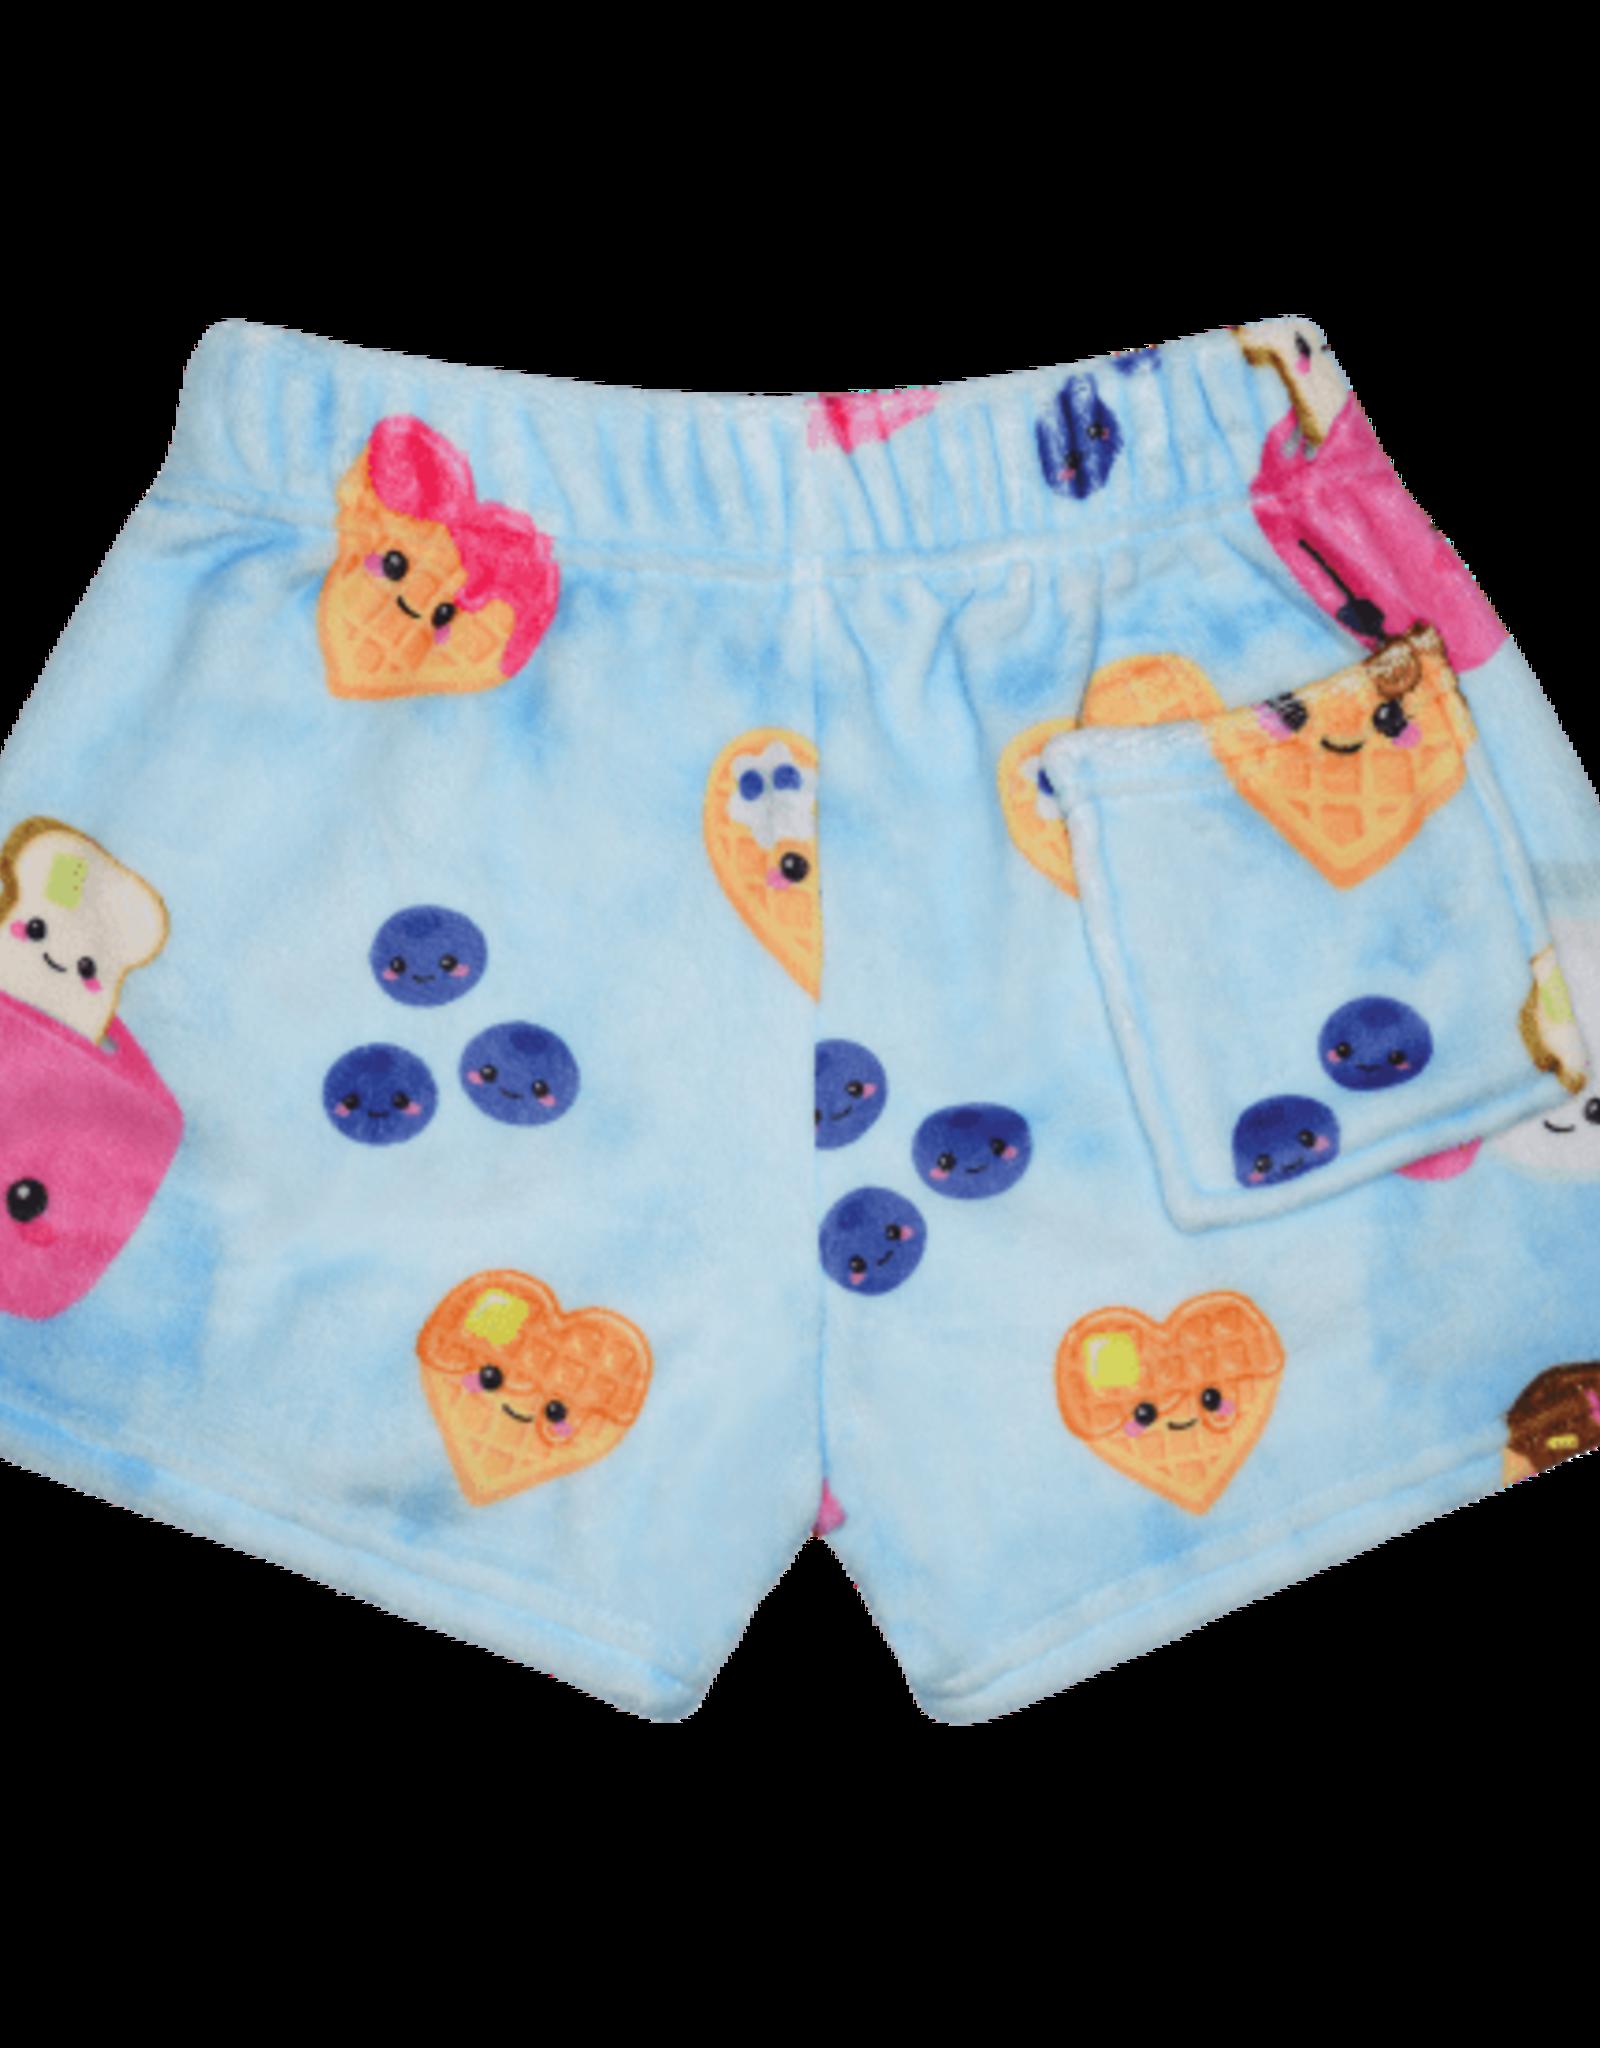 Iscream Breakfast Fun Plush Shorts